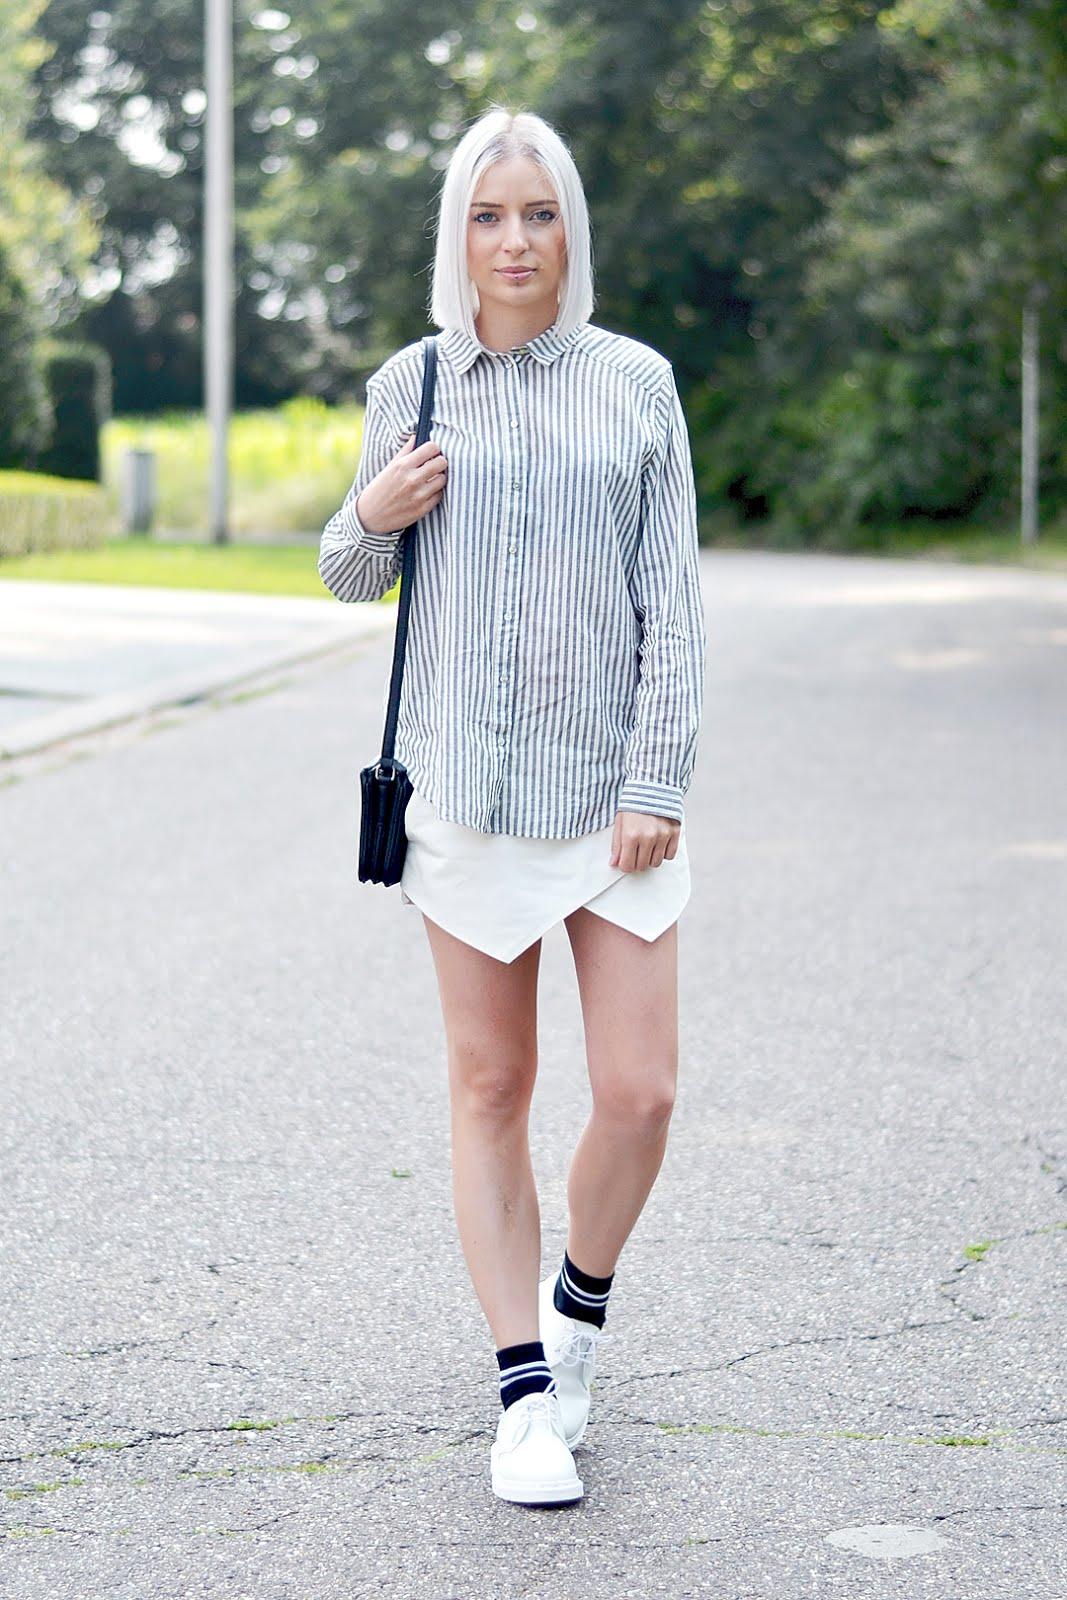 Mono white dr martens, grey striped shirt, zara skorts, sport socks, ootd